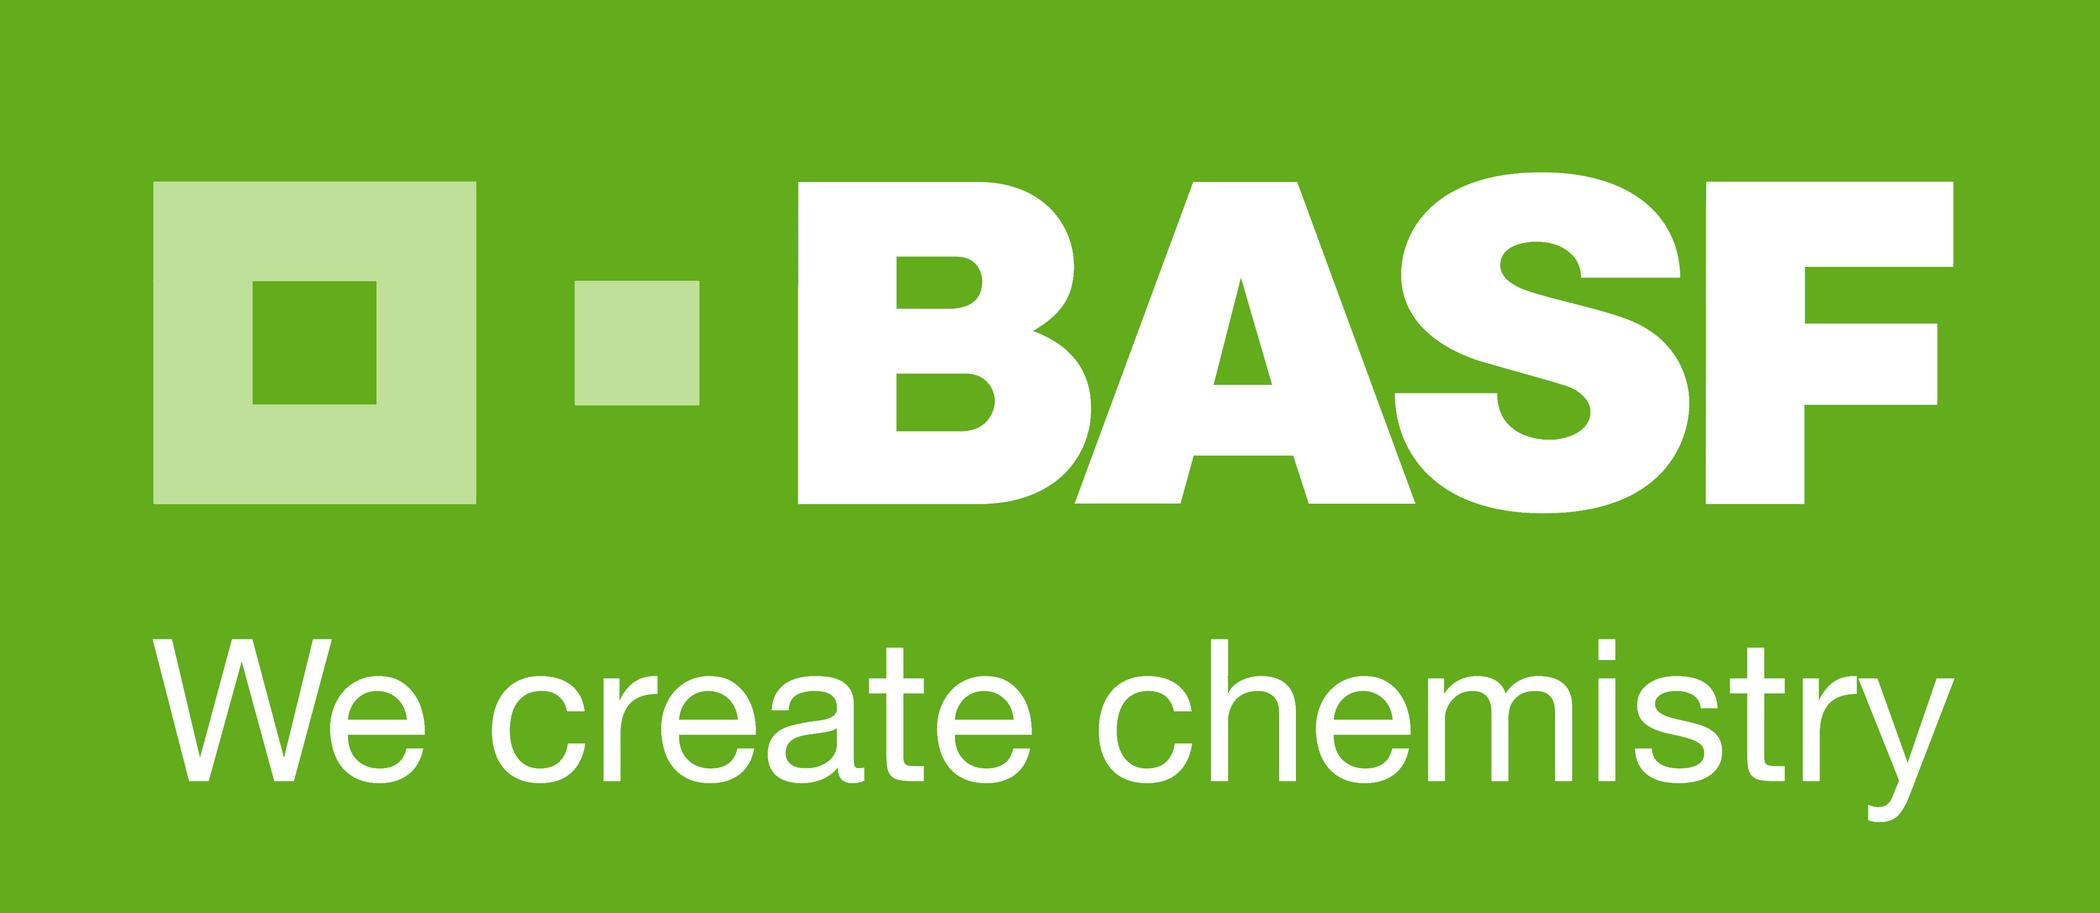 basf_logo_freelogovectors.net_.png